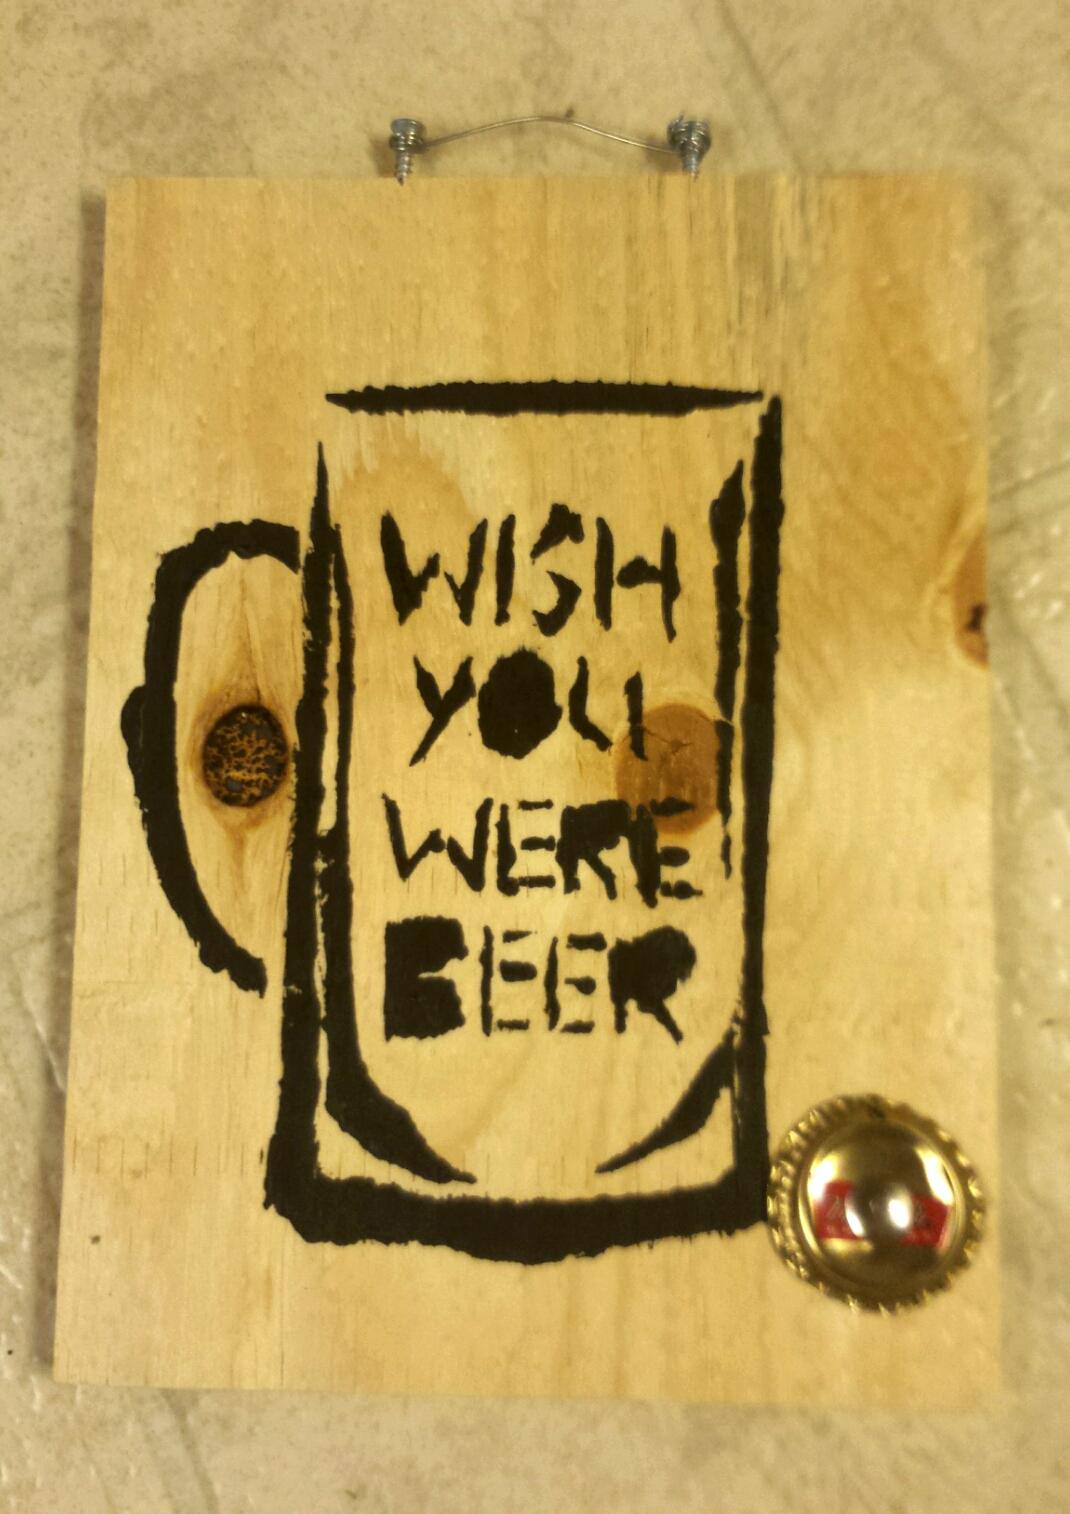 Stencil on Wood